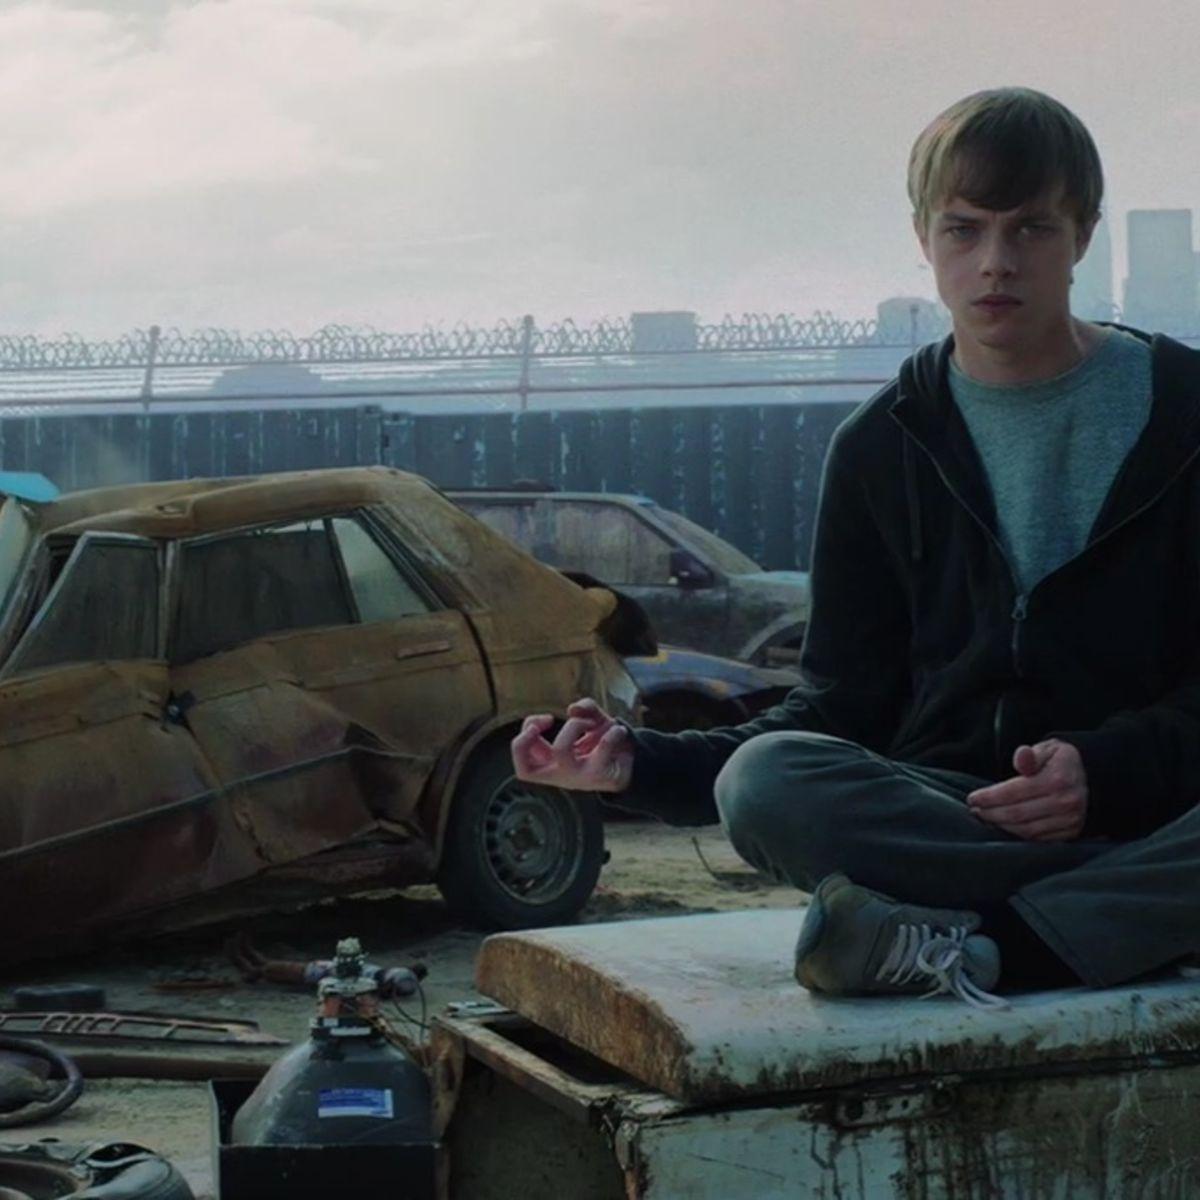 chronicle-best-movies-of-2012.jpg